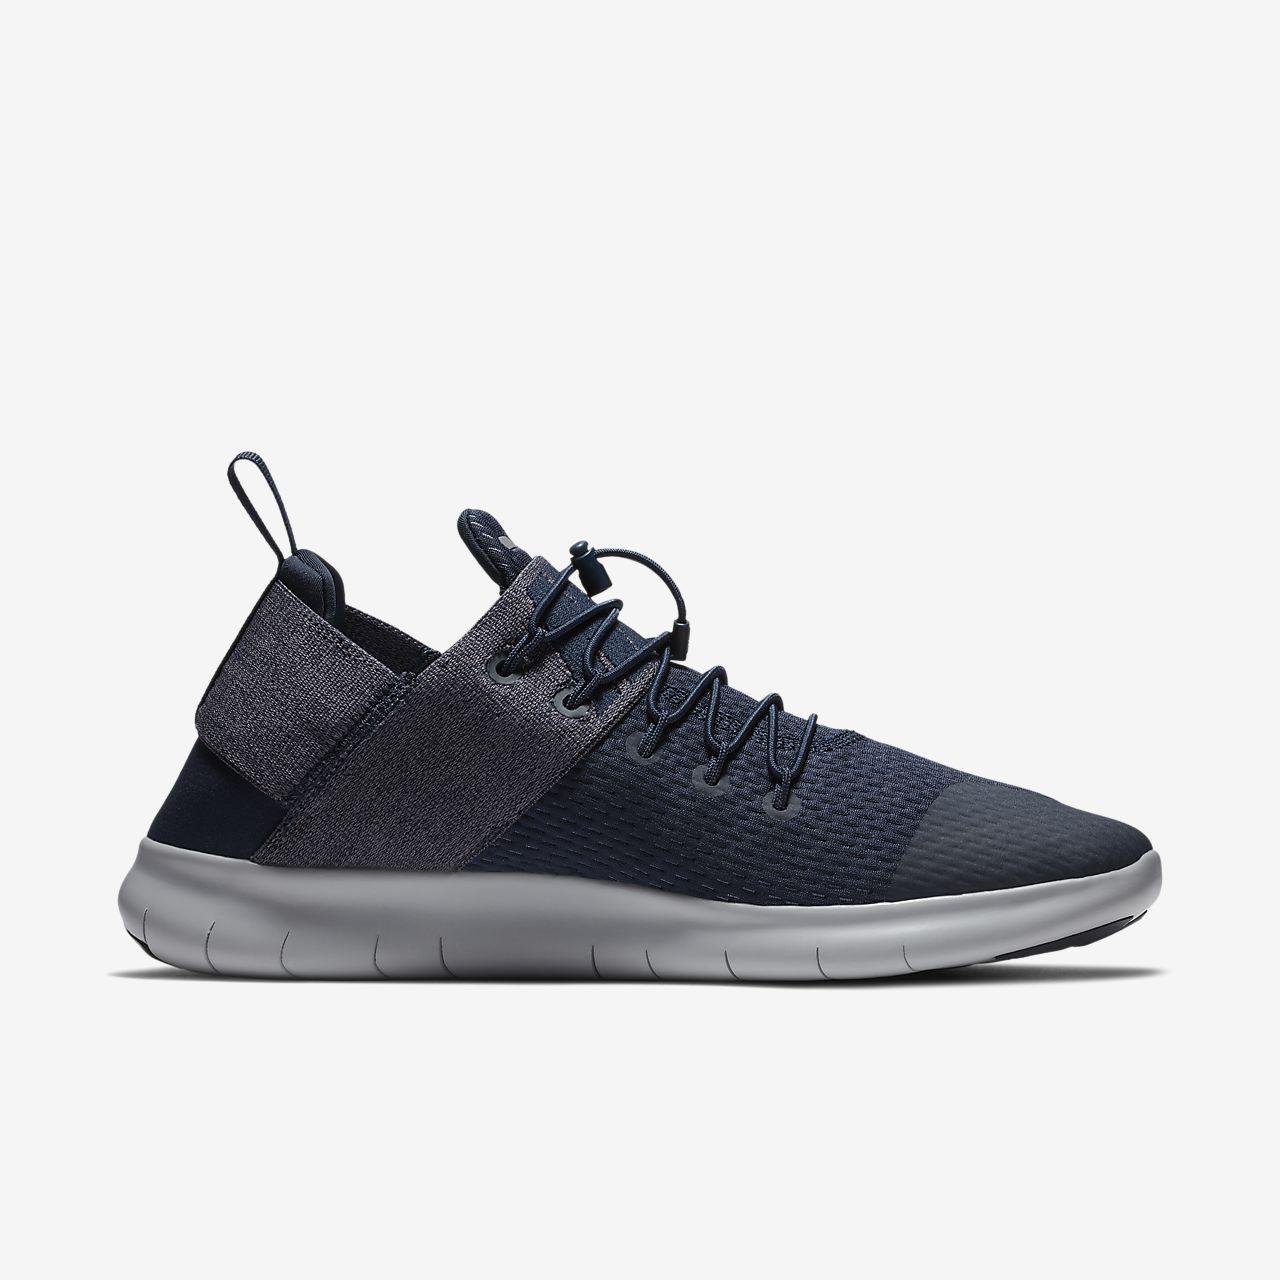 Chaussures Nike Free Running Run Banlieusard 2017 Hommes BrNtkow